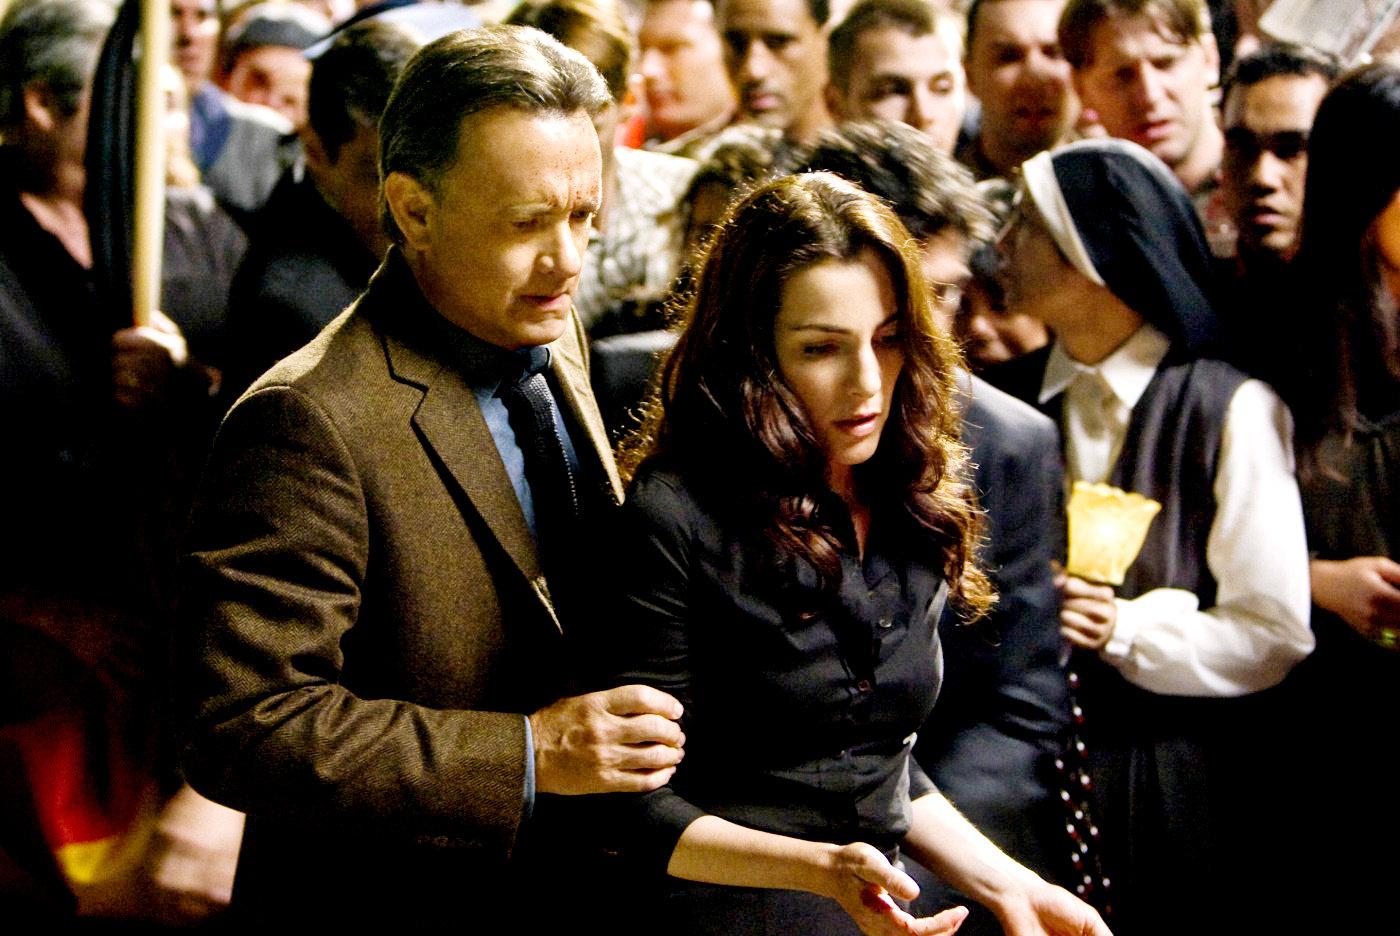 Robert Langdon and Vittoria Vetra look for clues...